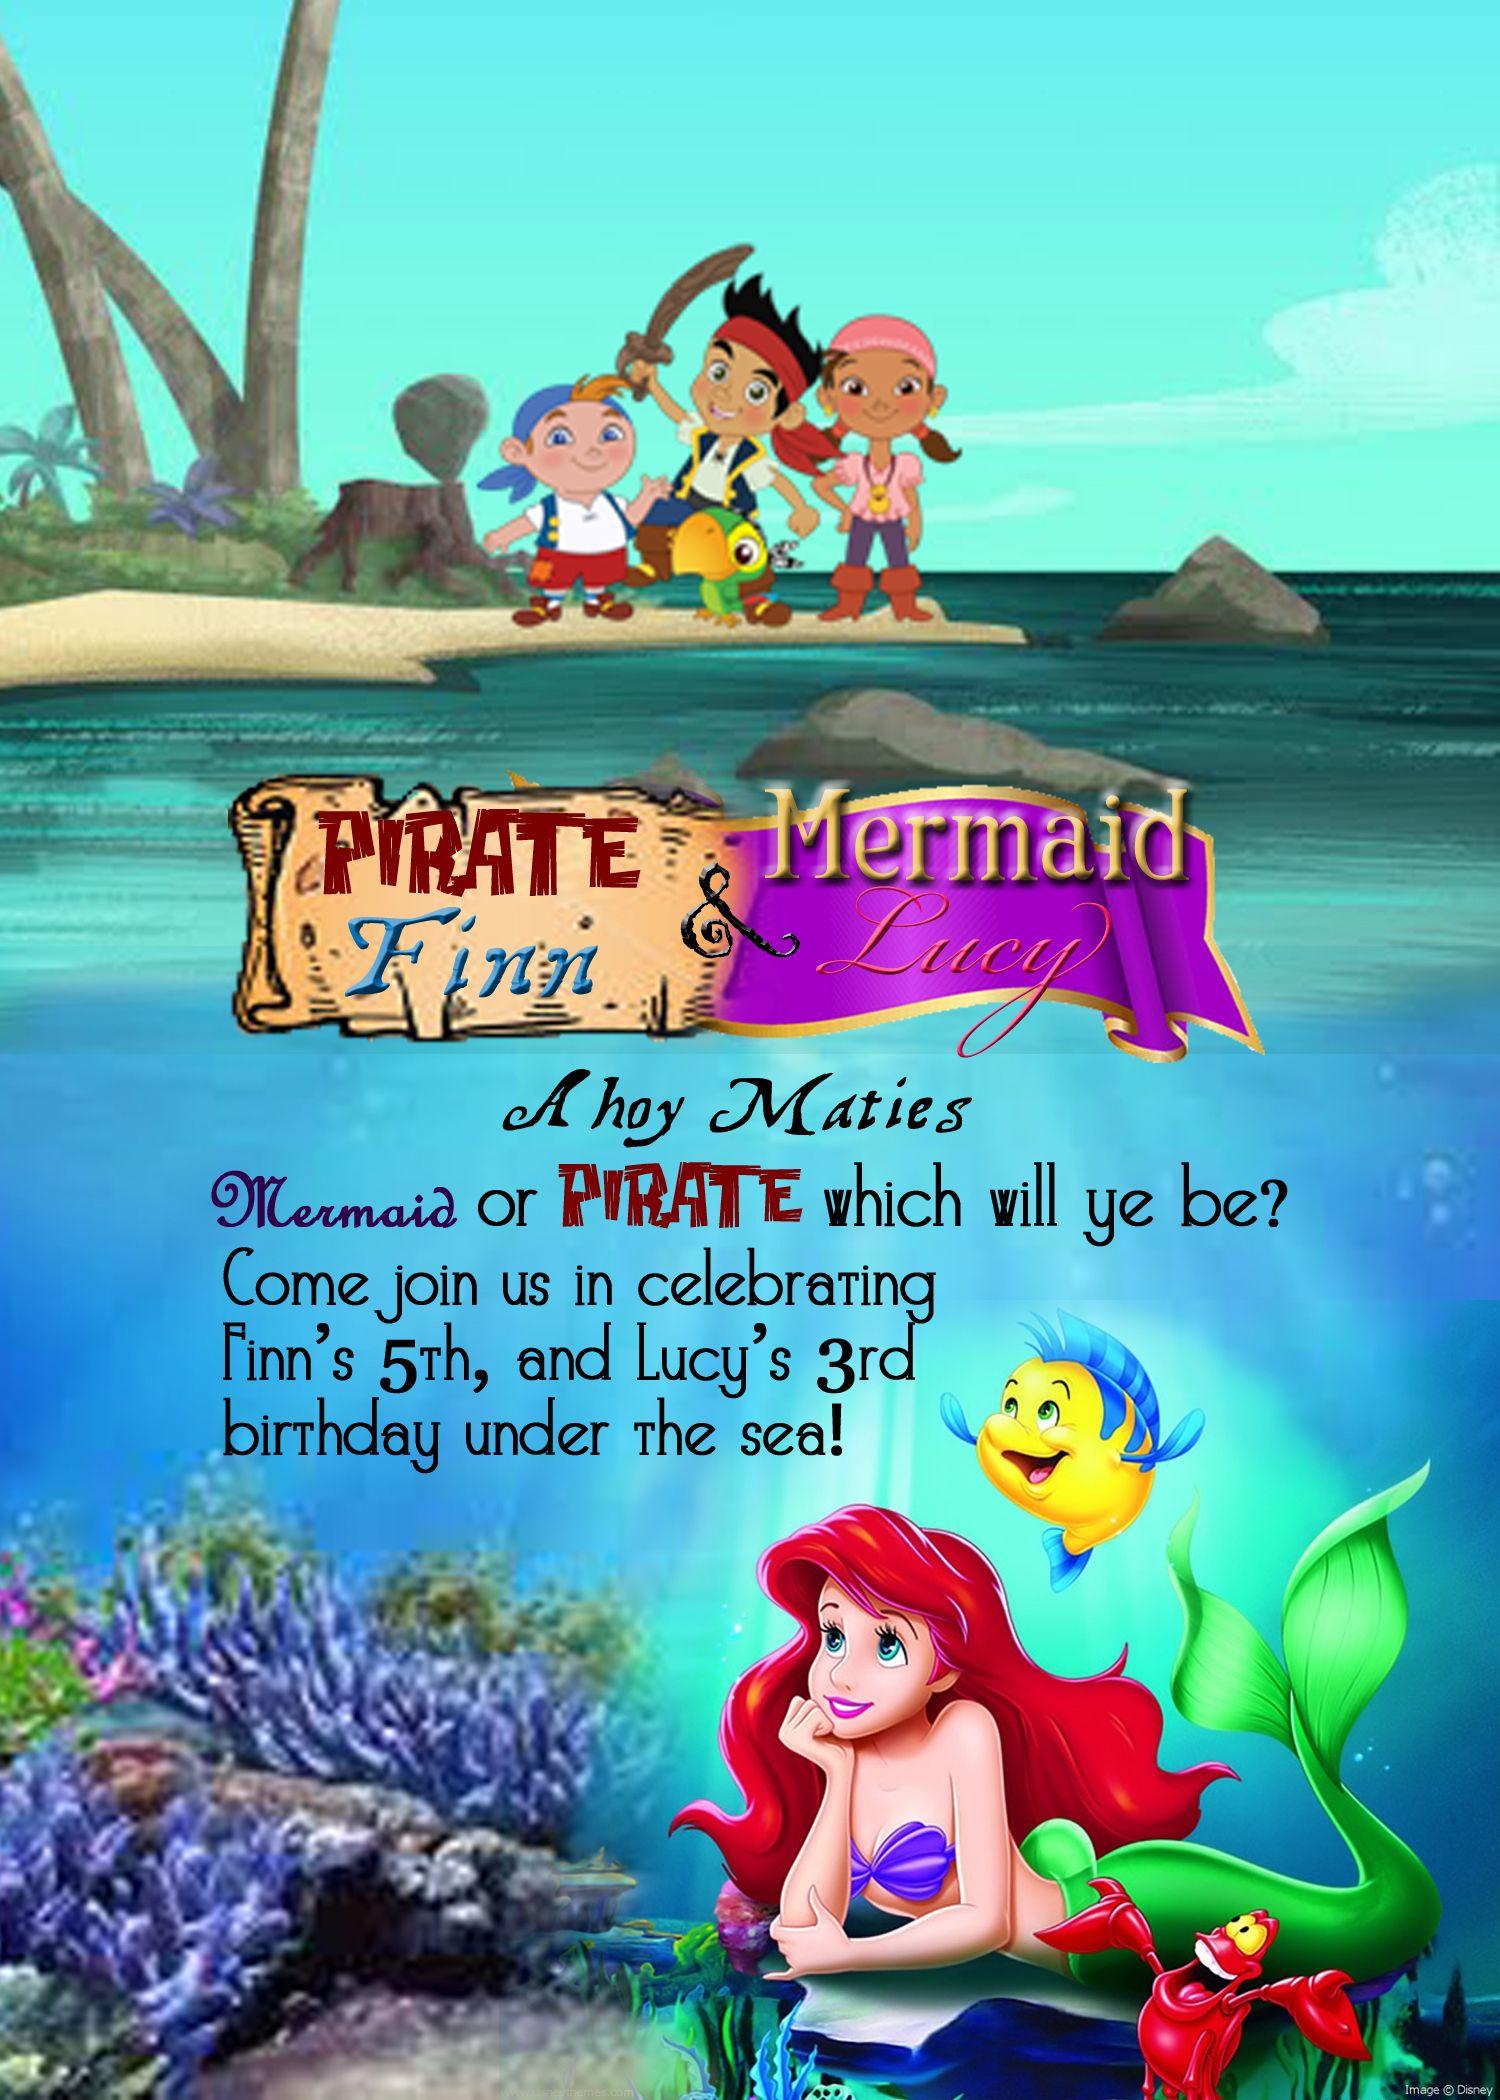 jen virch creations mermaid pirate birthday jake and the